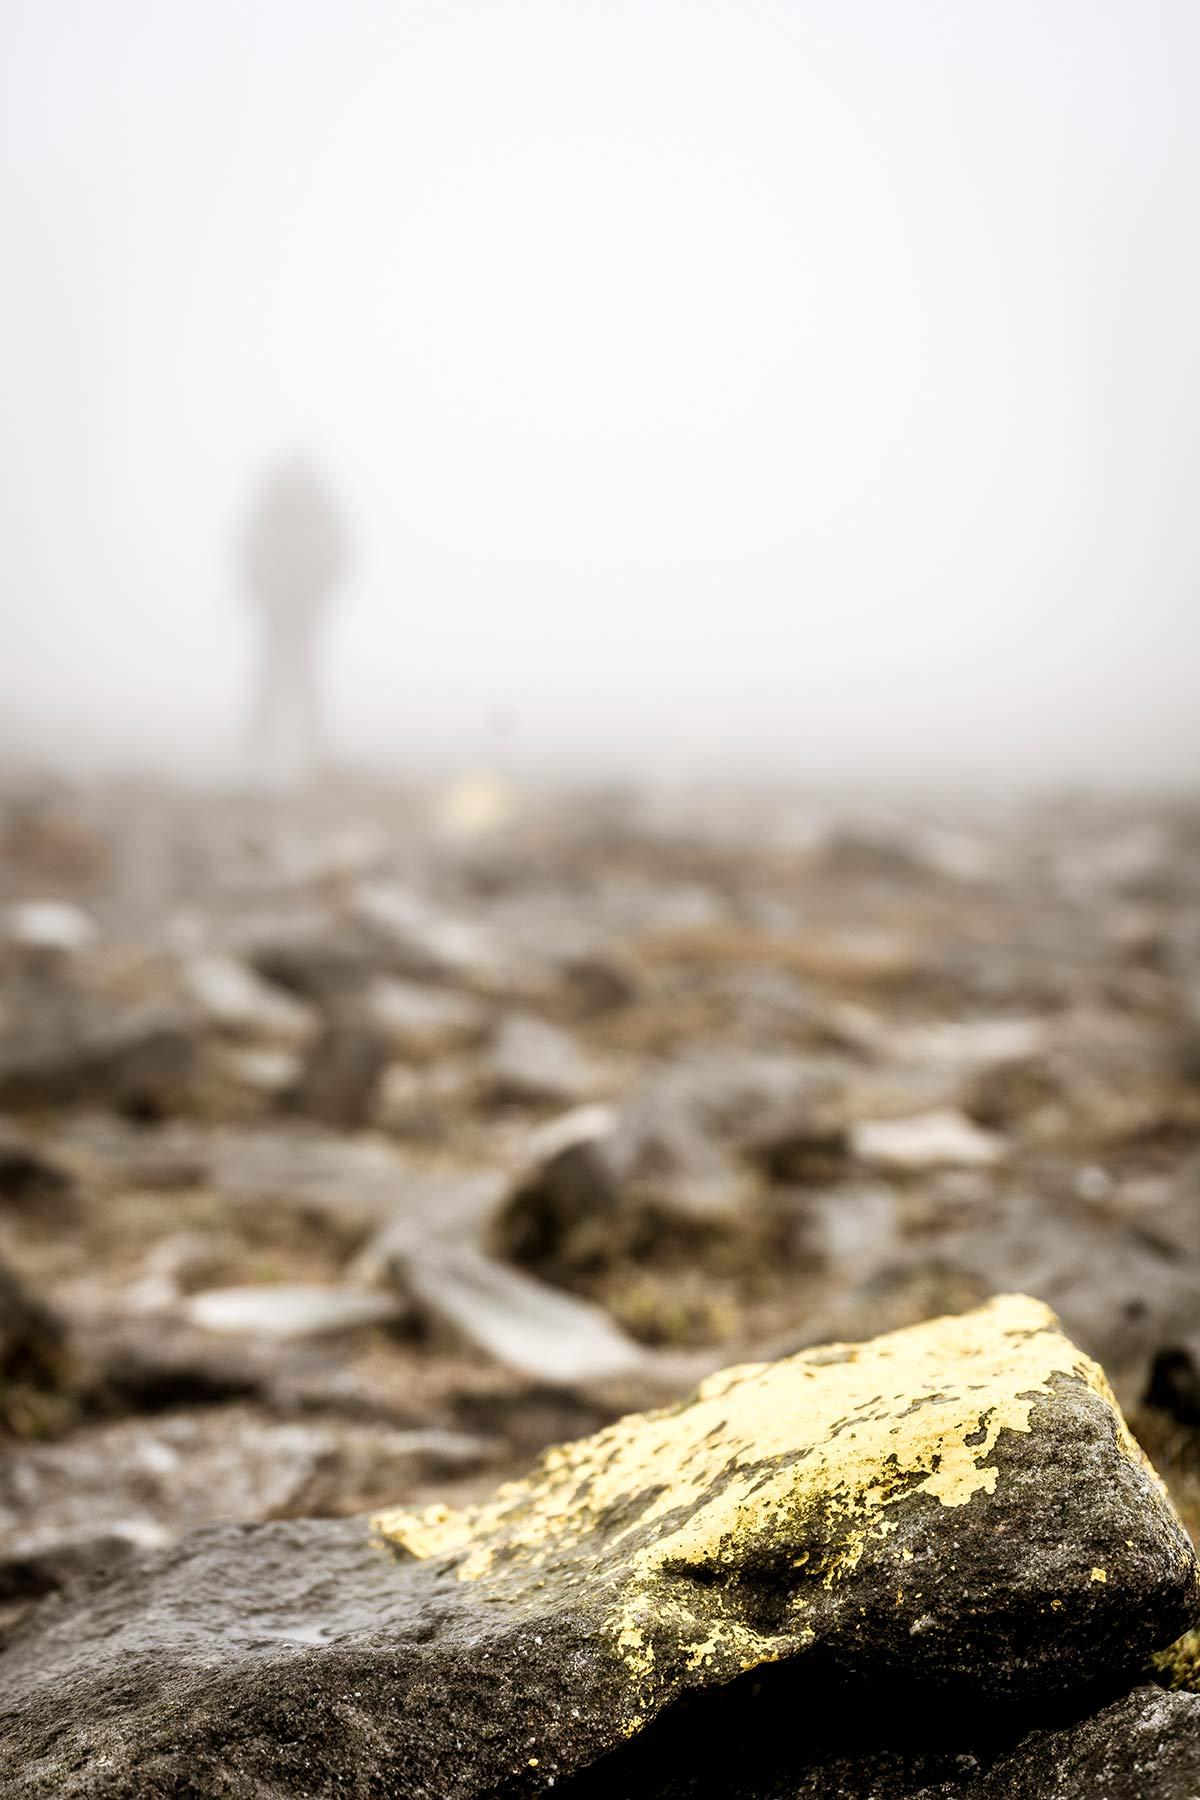 Irland Donegal Slieve Leage Klippen Markierung